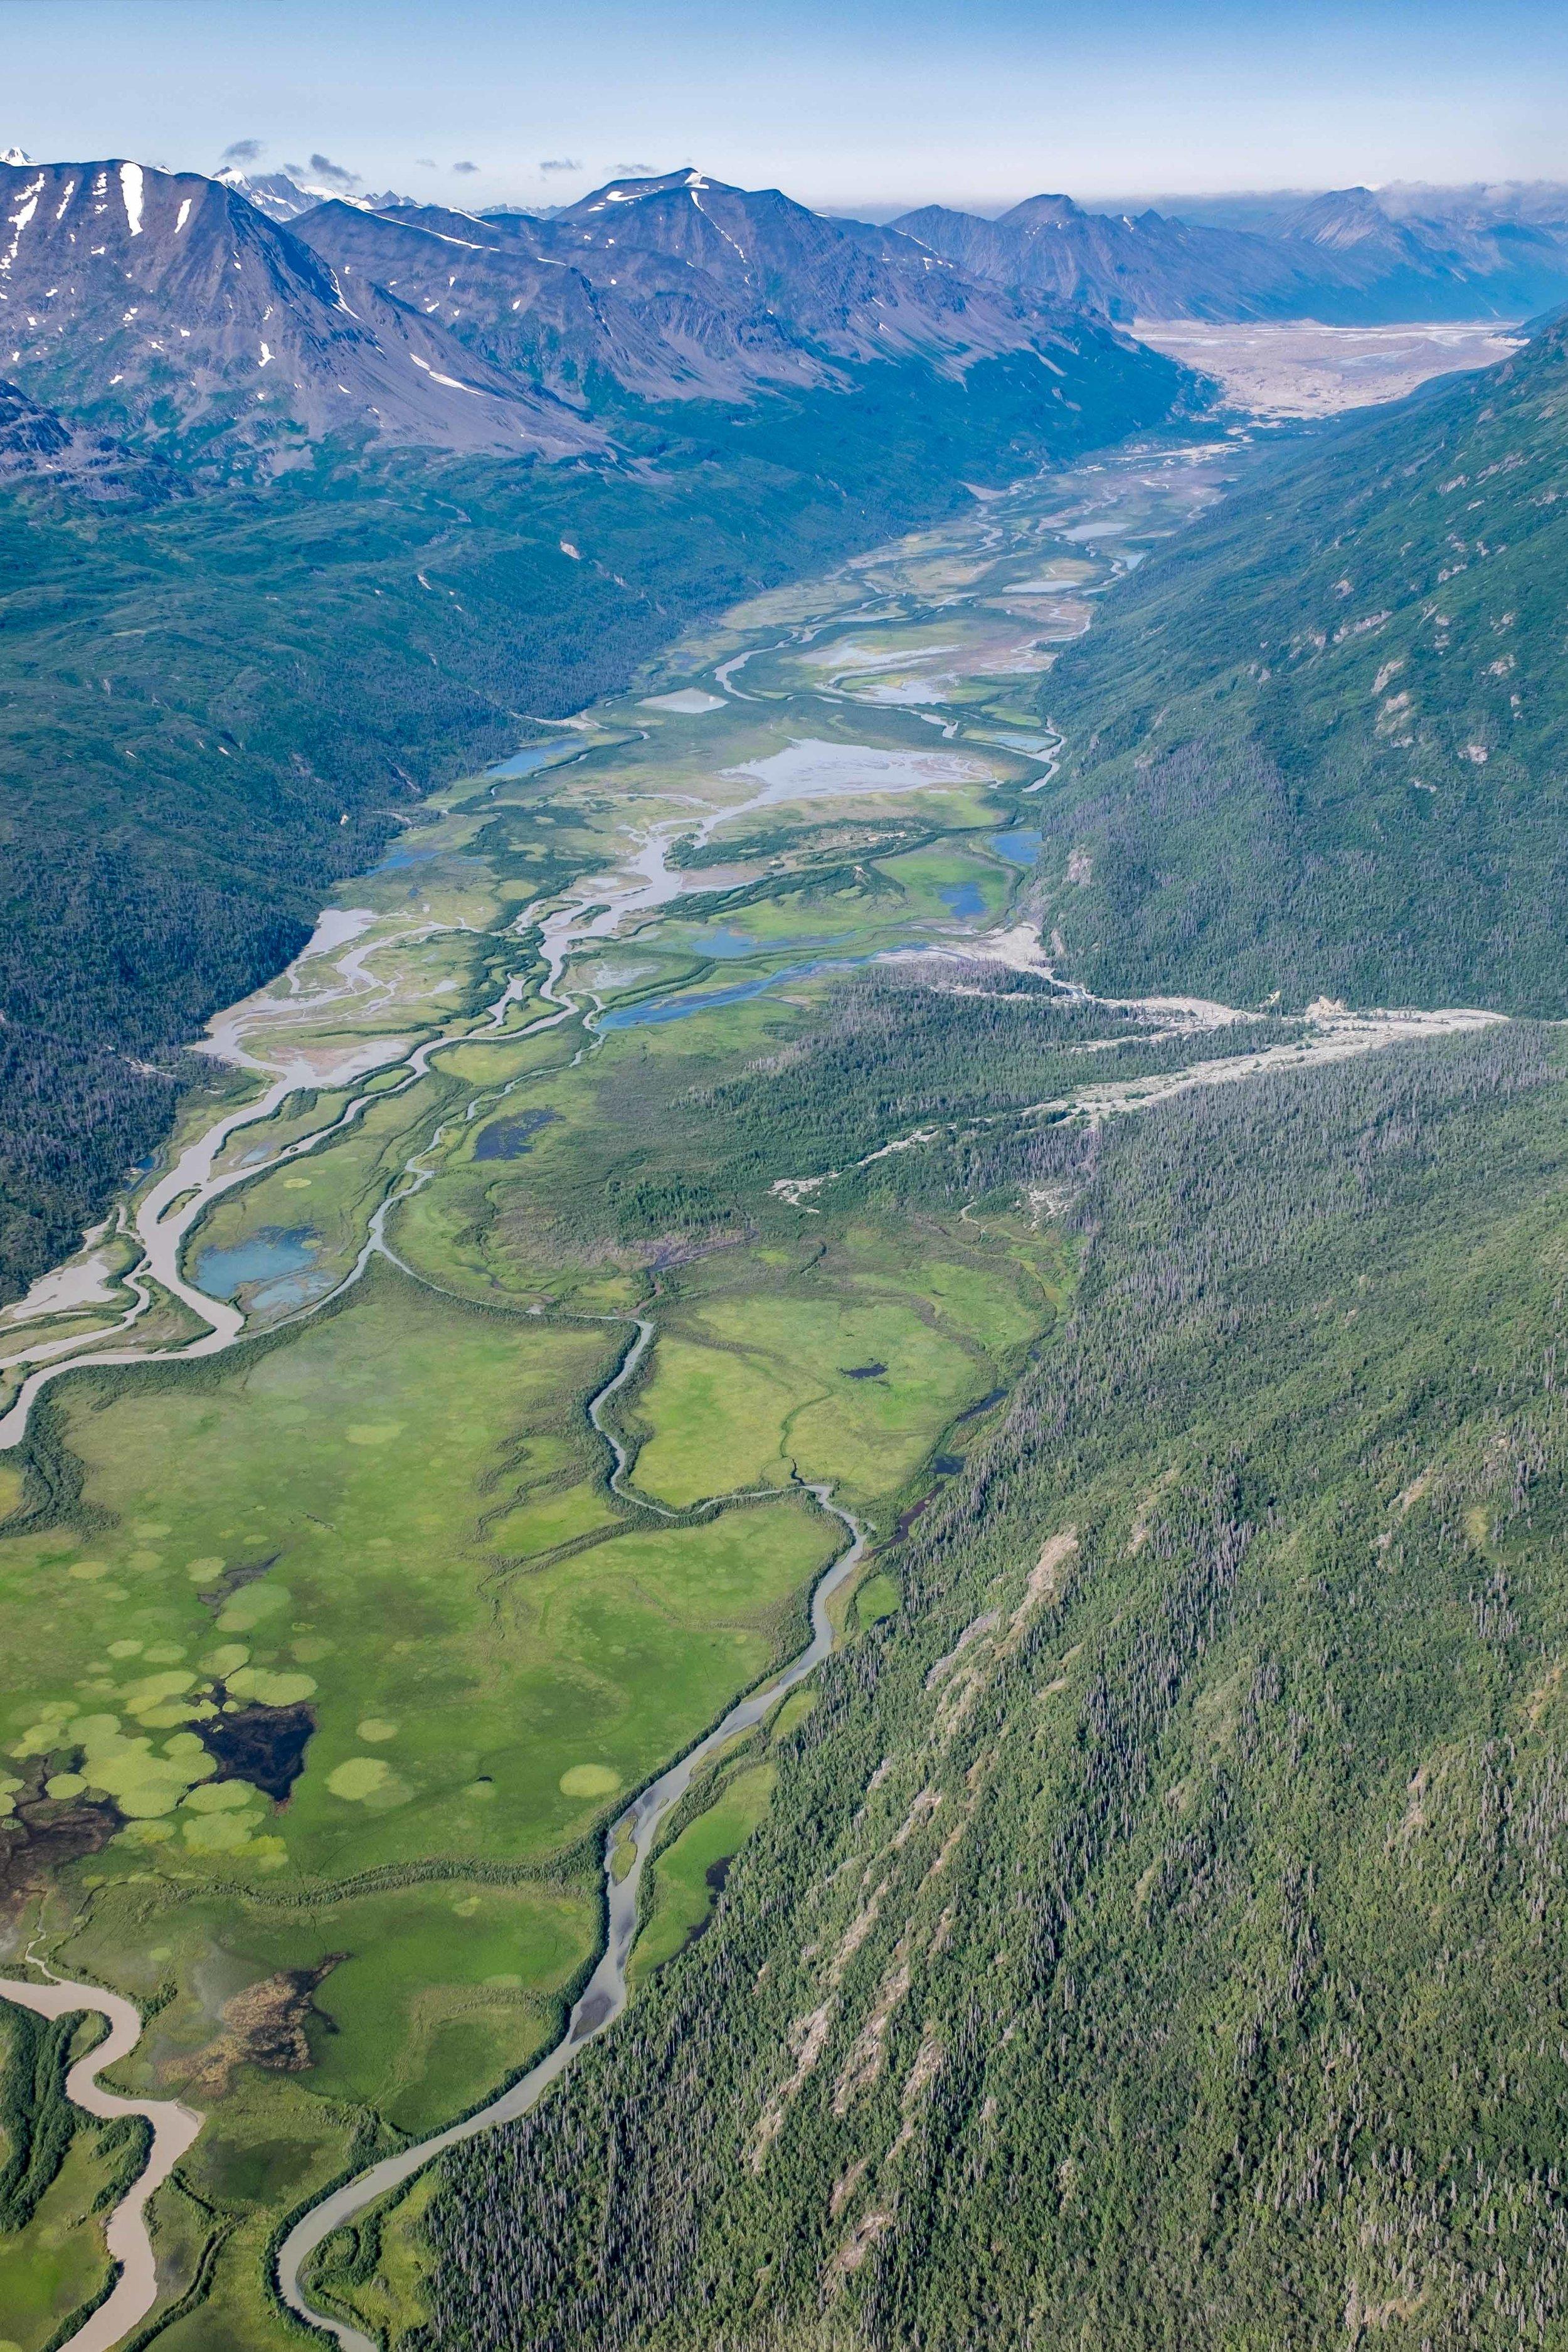 20160731-JI-Wrangell St Elias National Park-_DSF1120.jpg